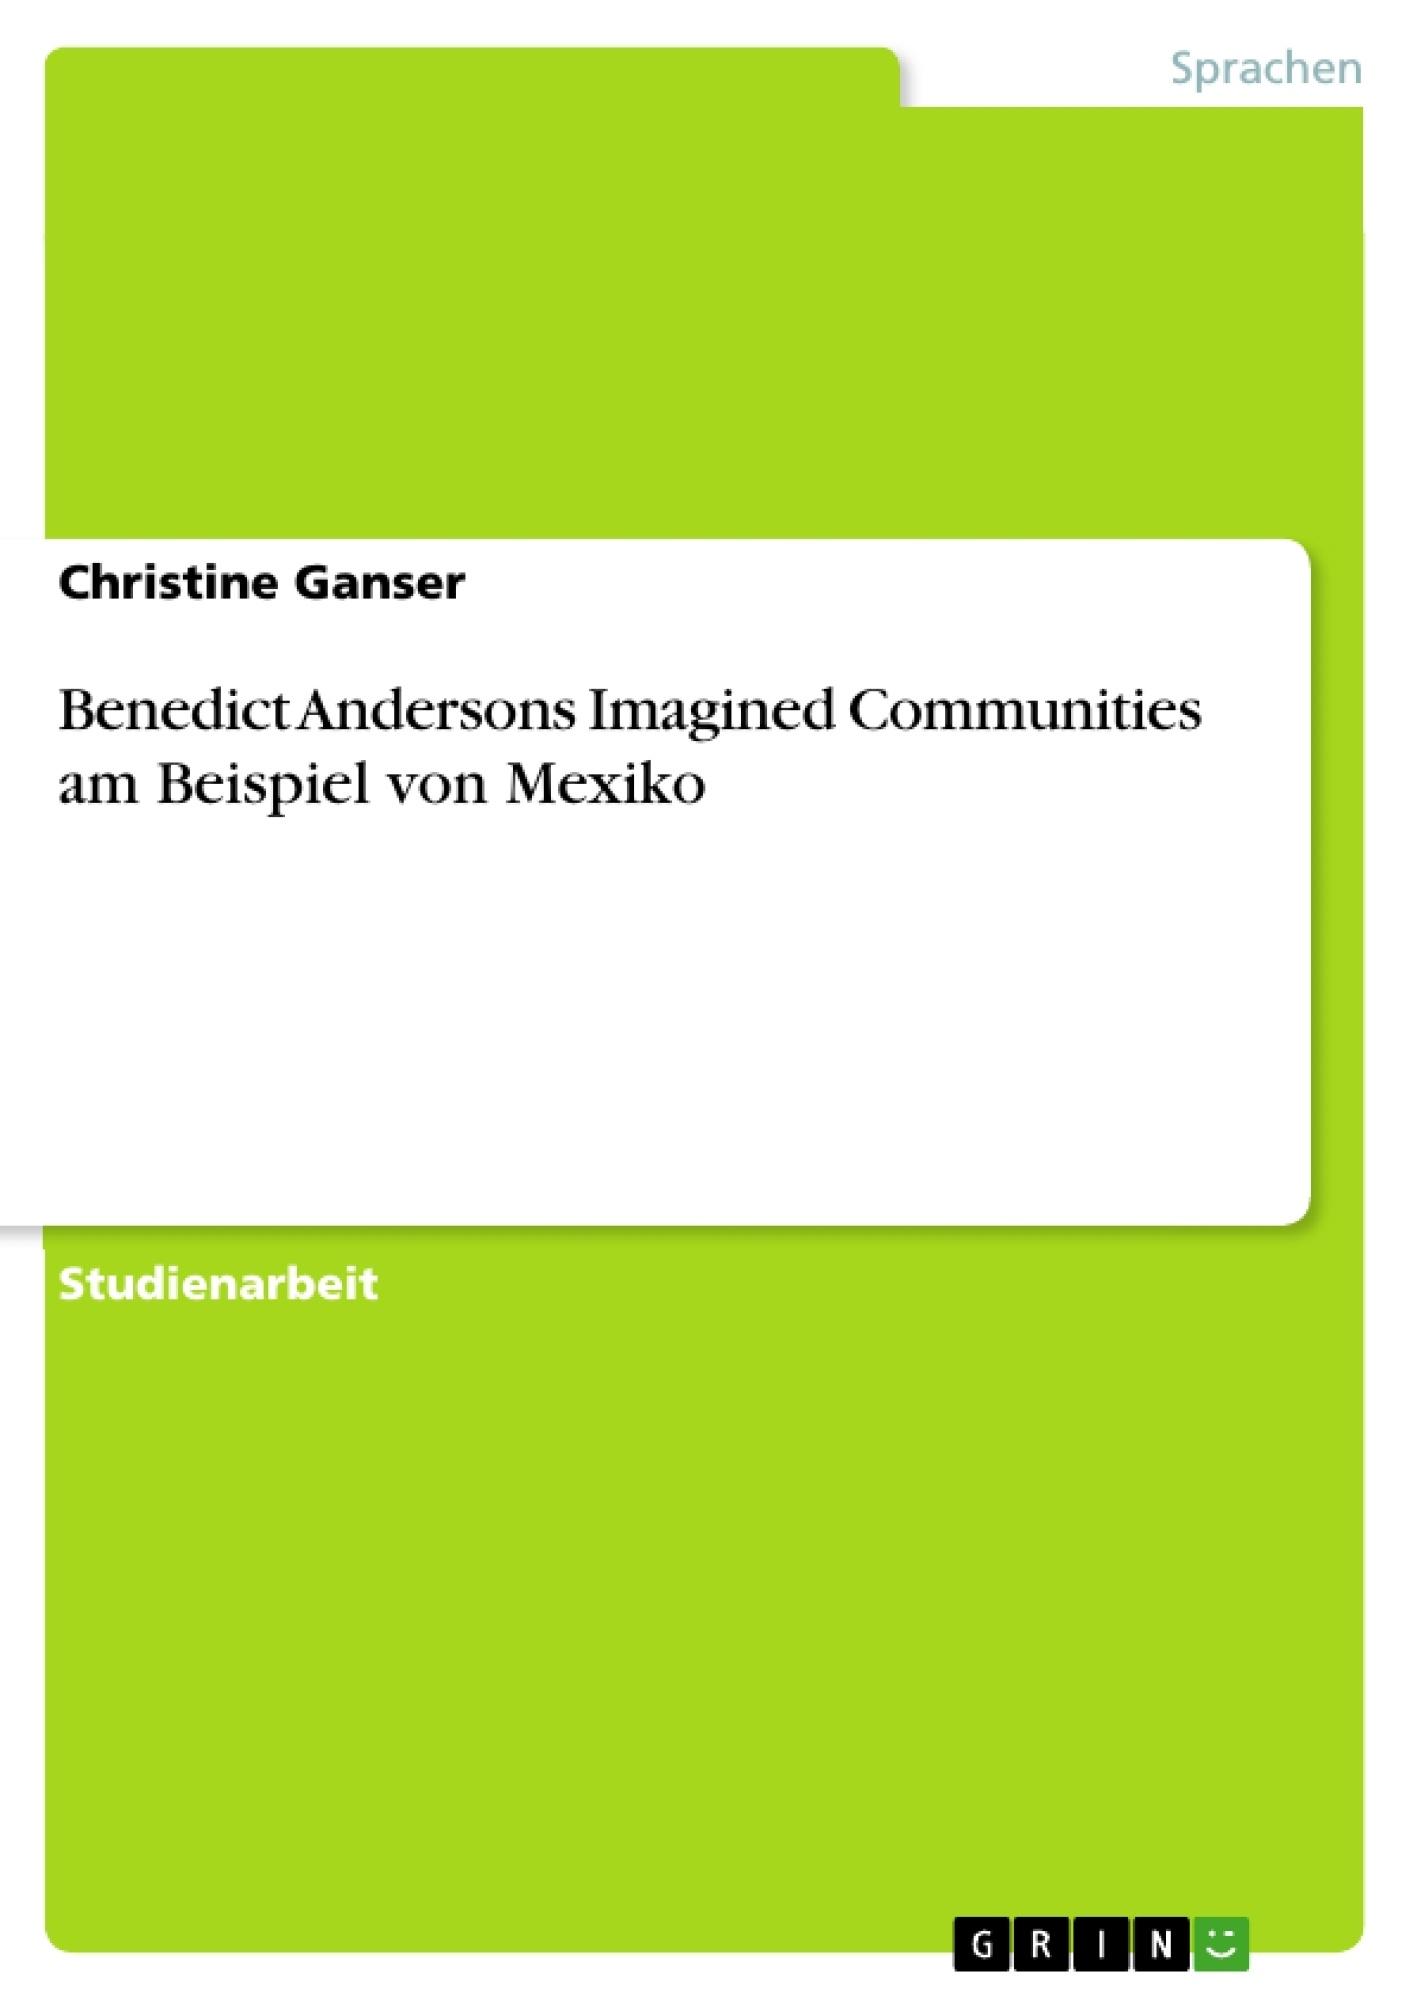 Titel: Benedict Andersons Imagined Communities am Beispiel von Mexiko